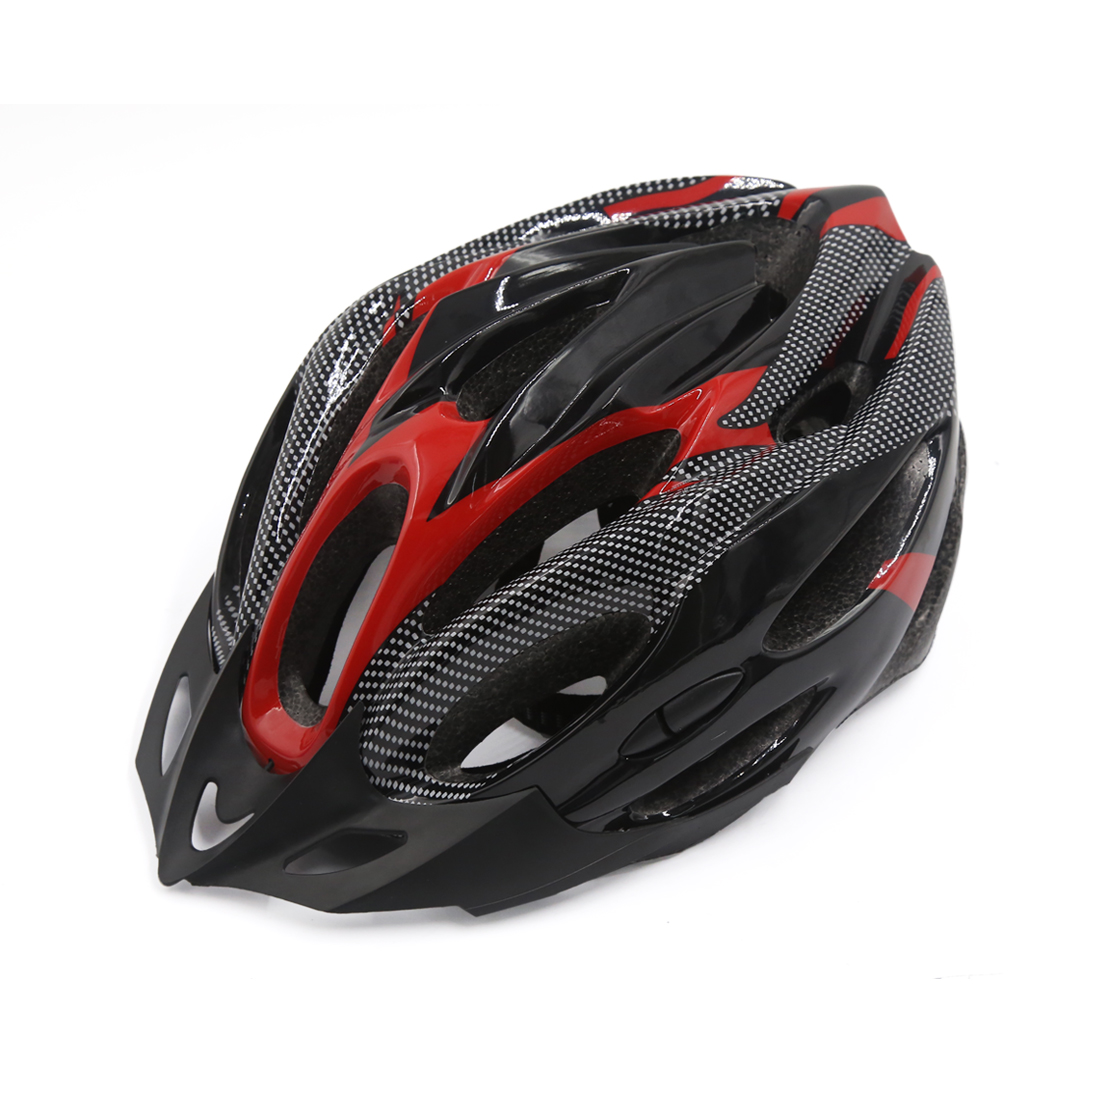 Carbon Fiber Pattern 21 Holes Cycling Bicycle Soprt Bike Safety Helmet Visor Red